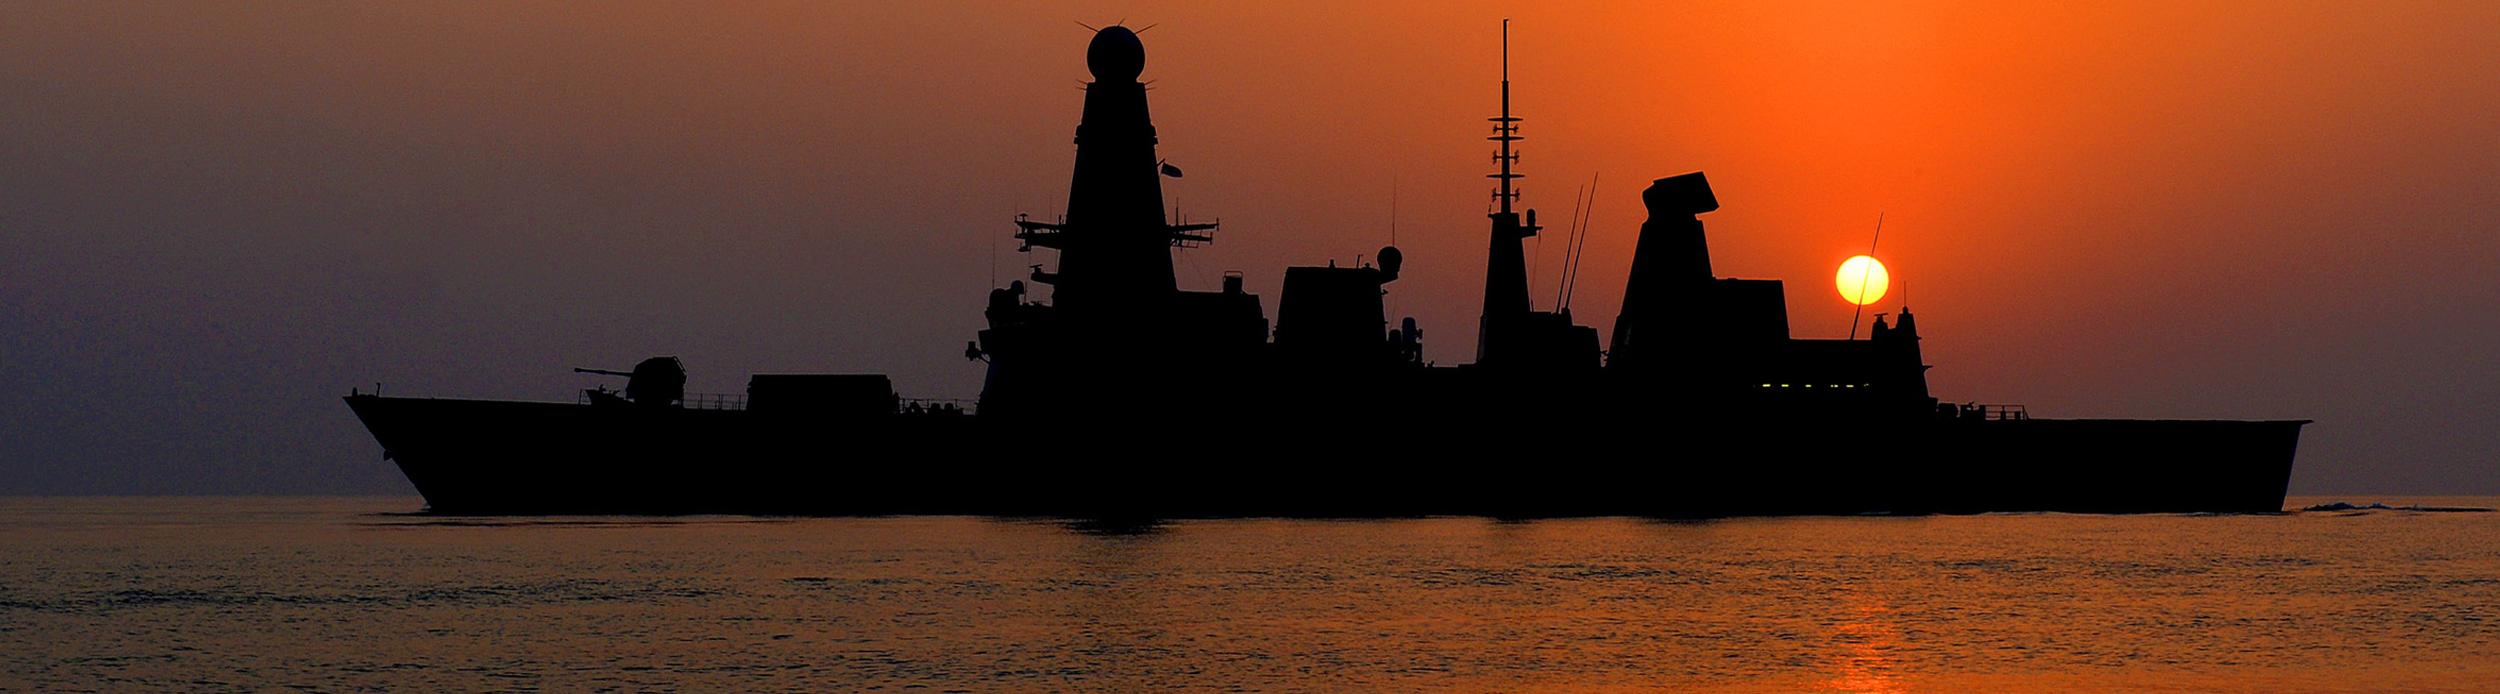 HMS Dragon silhouete